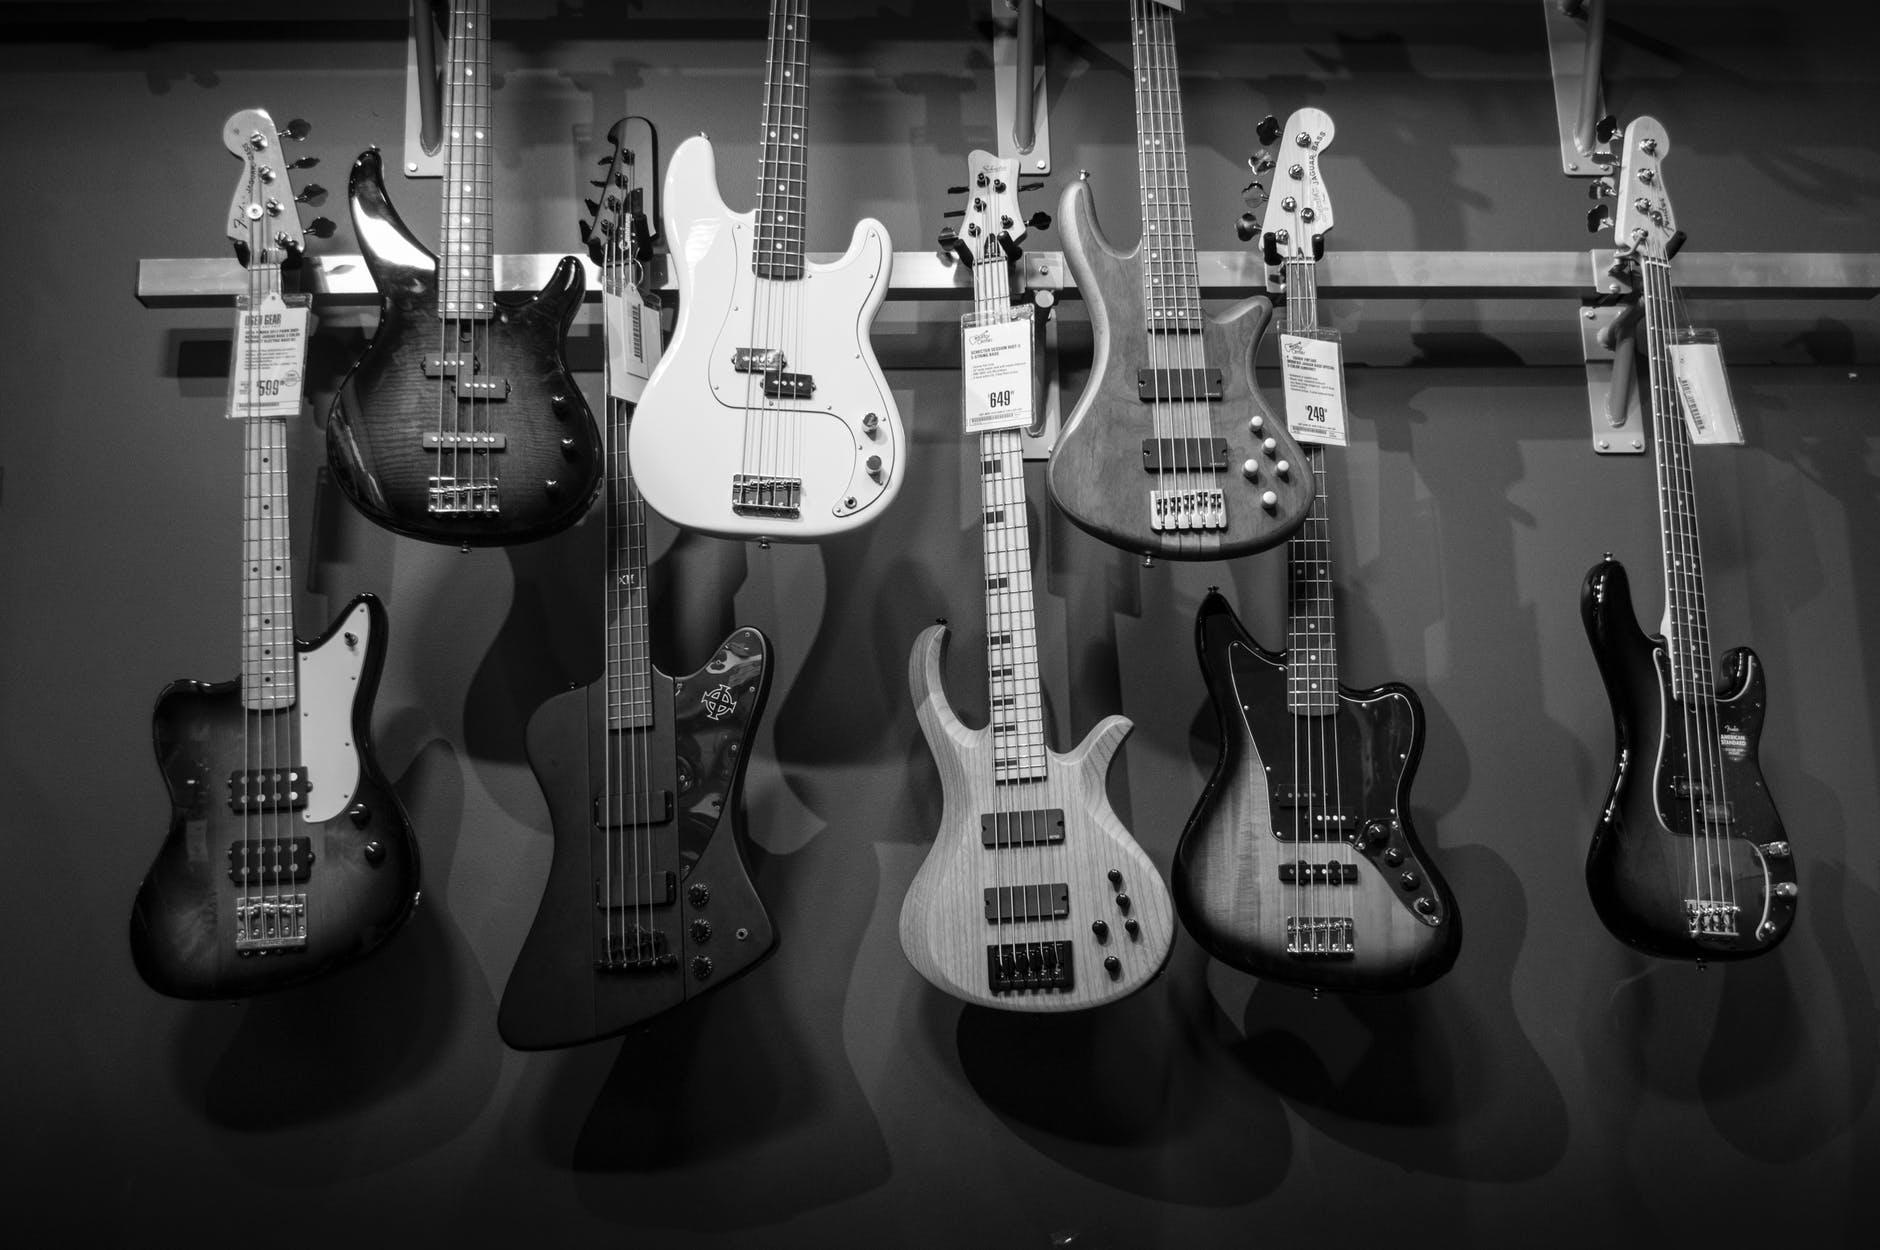 Flera olika gitarrer